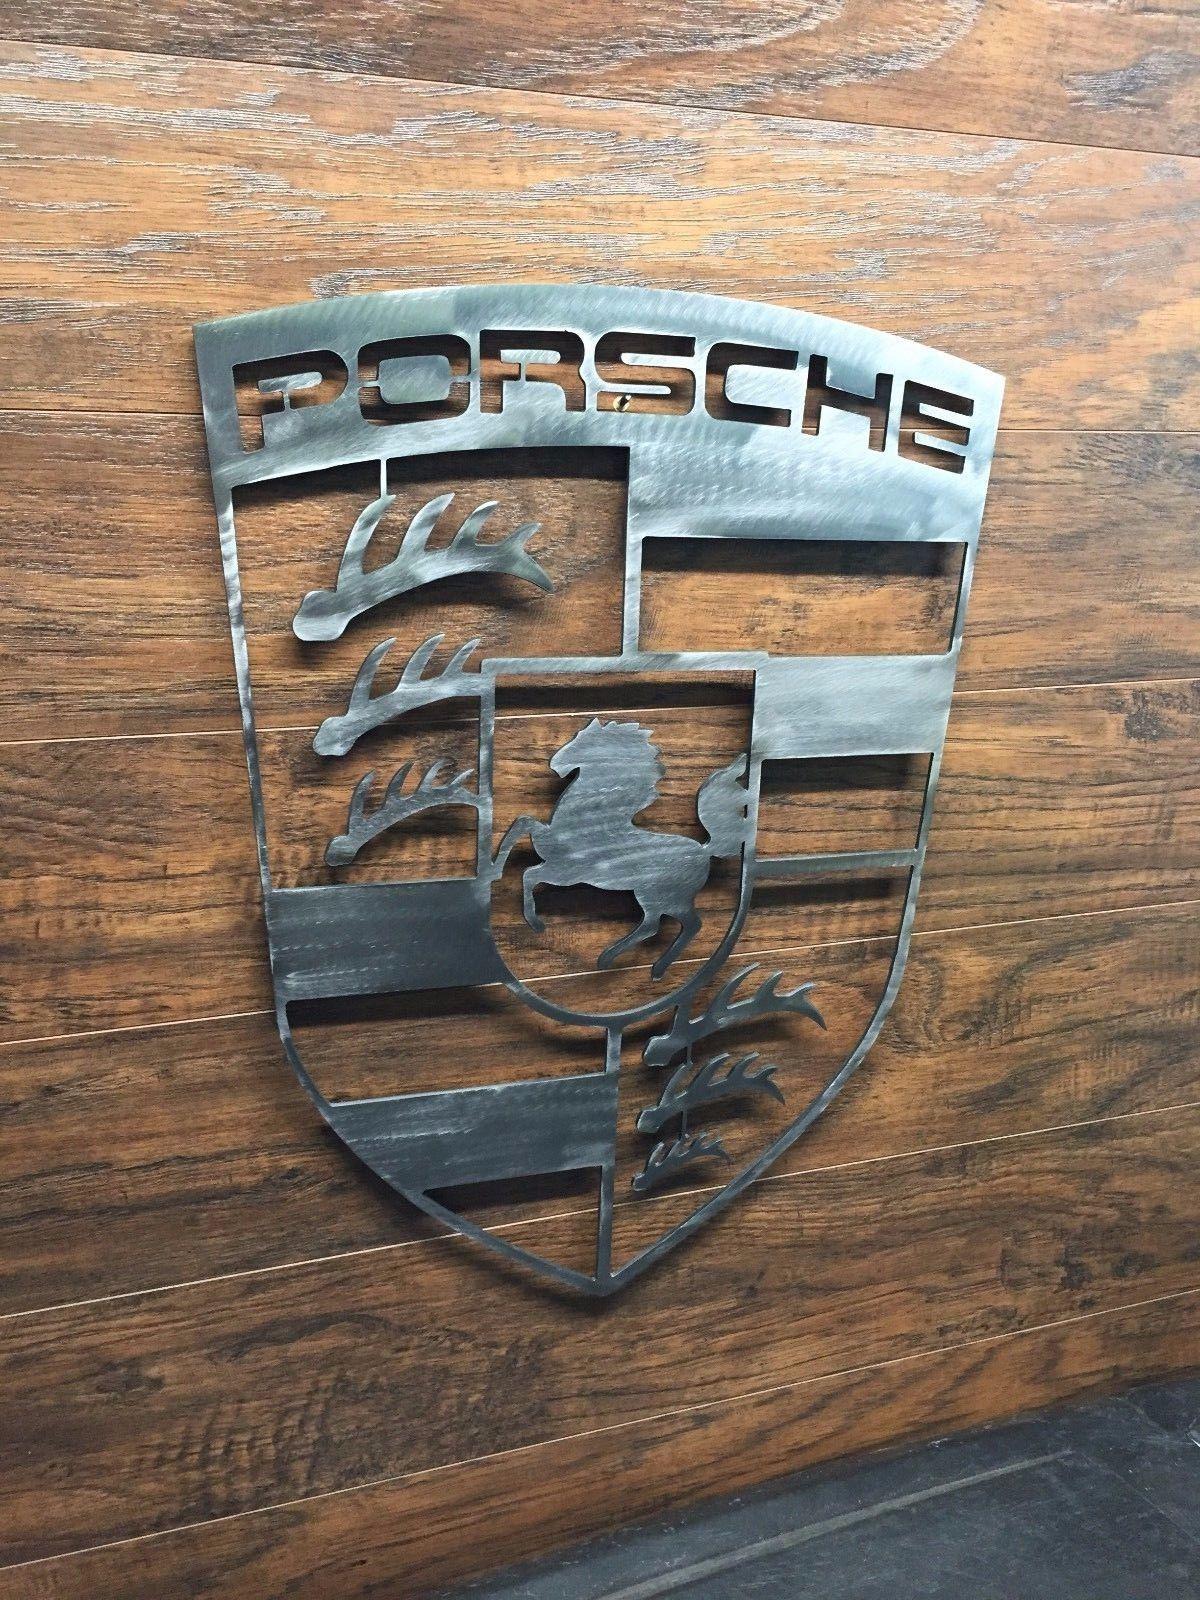 US $40.00 New other (see details) in Home u0026 Garden Home Décor Wall Sculptures & Porsche Logo Sign Metal Wall Art Decor Man Cave Performance Car ...